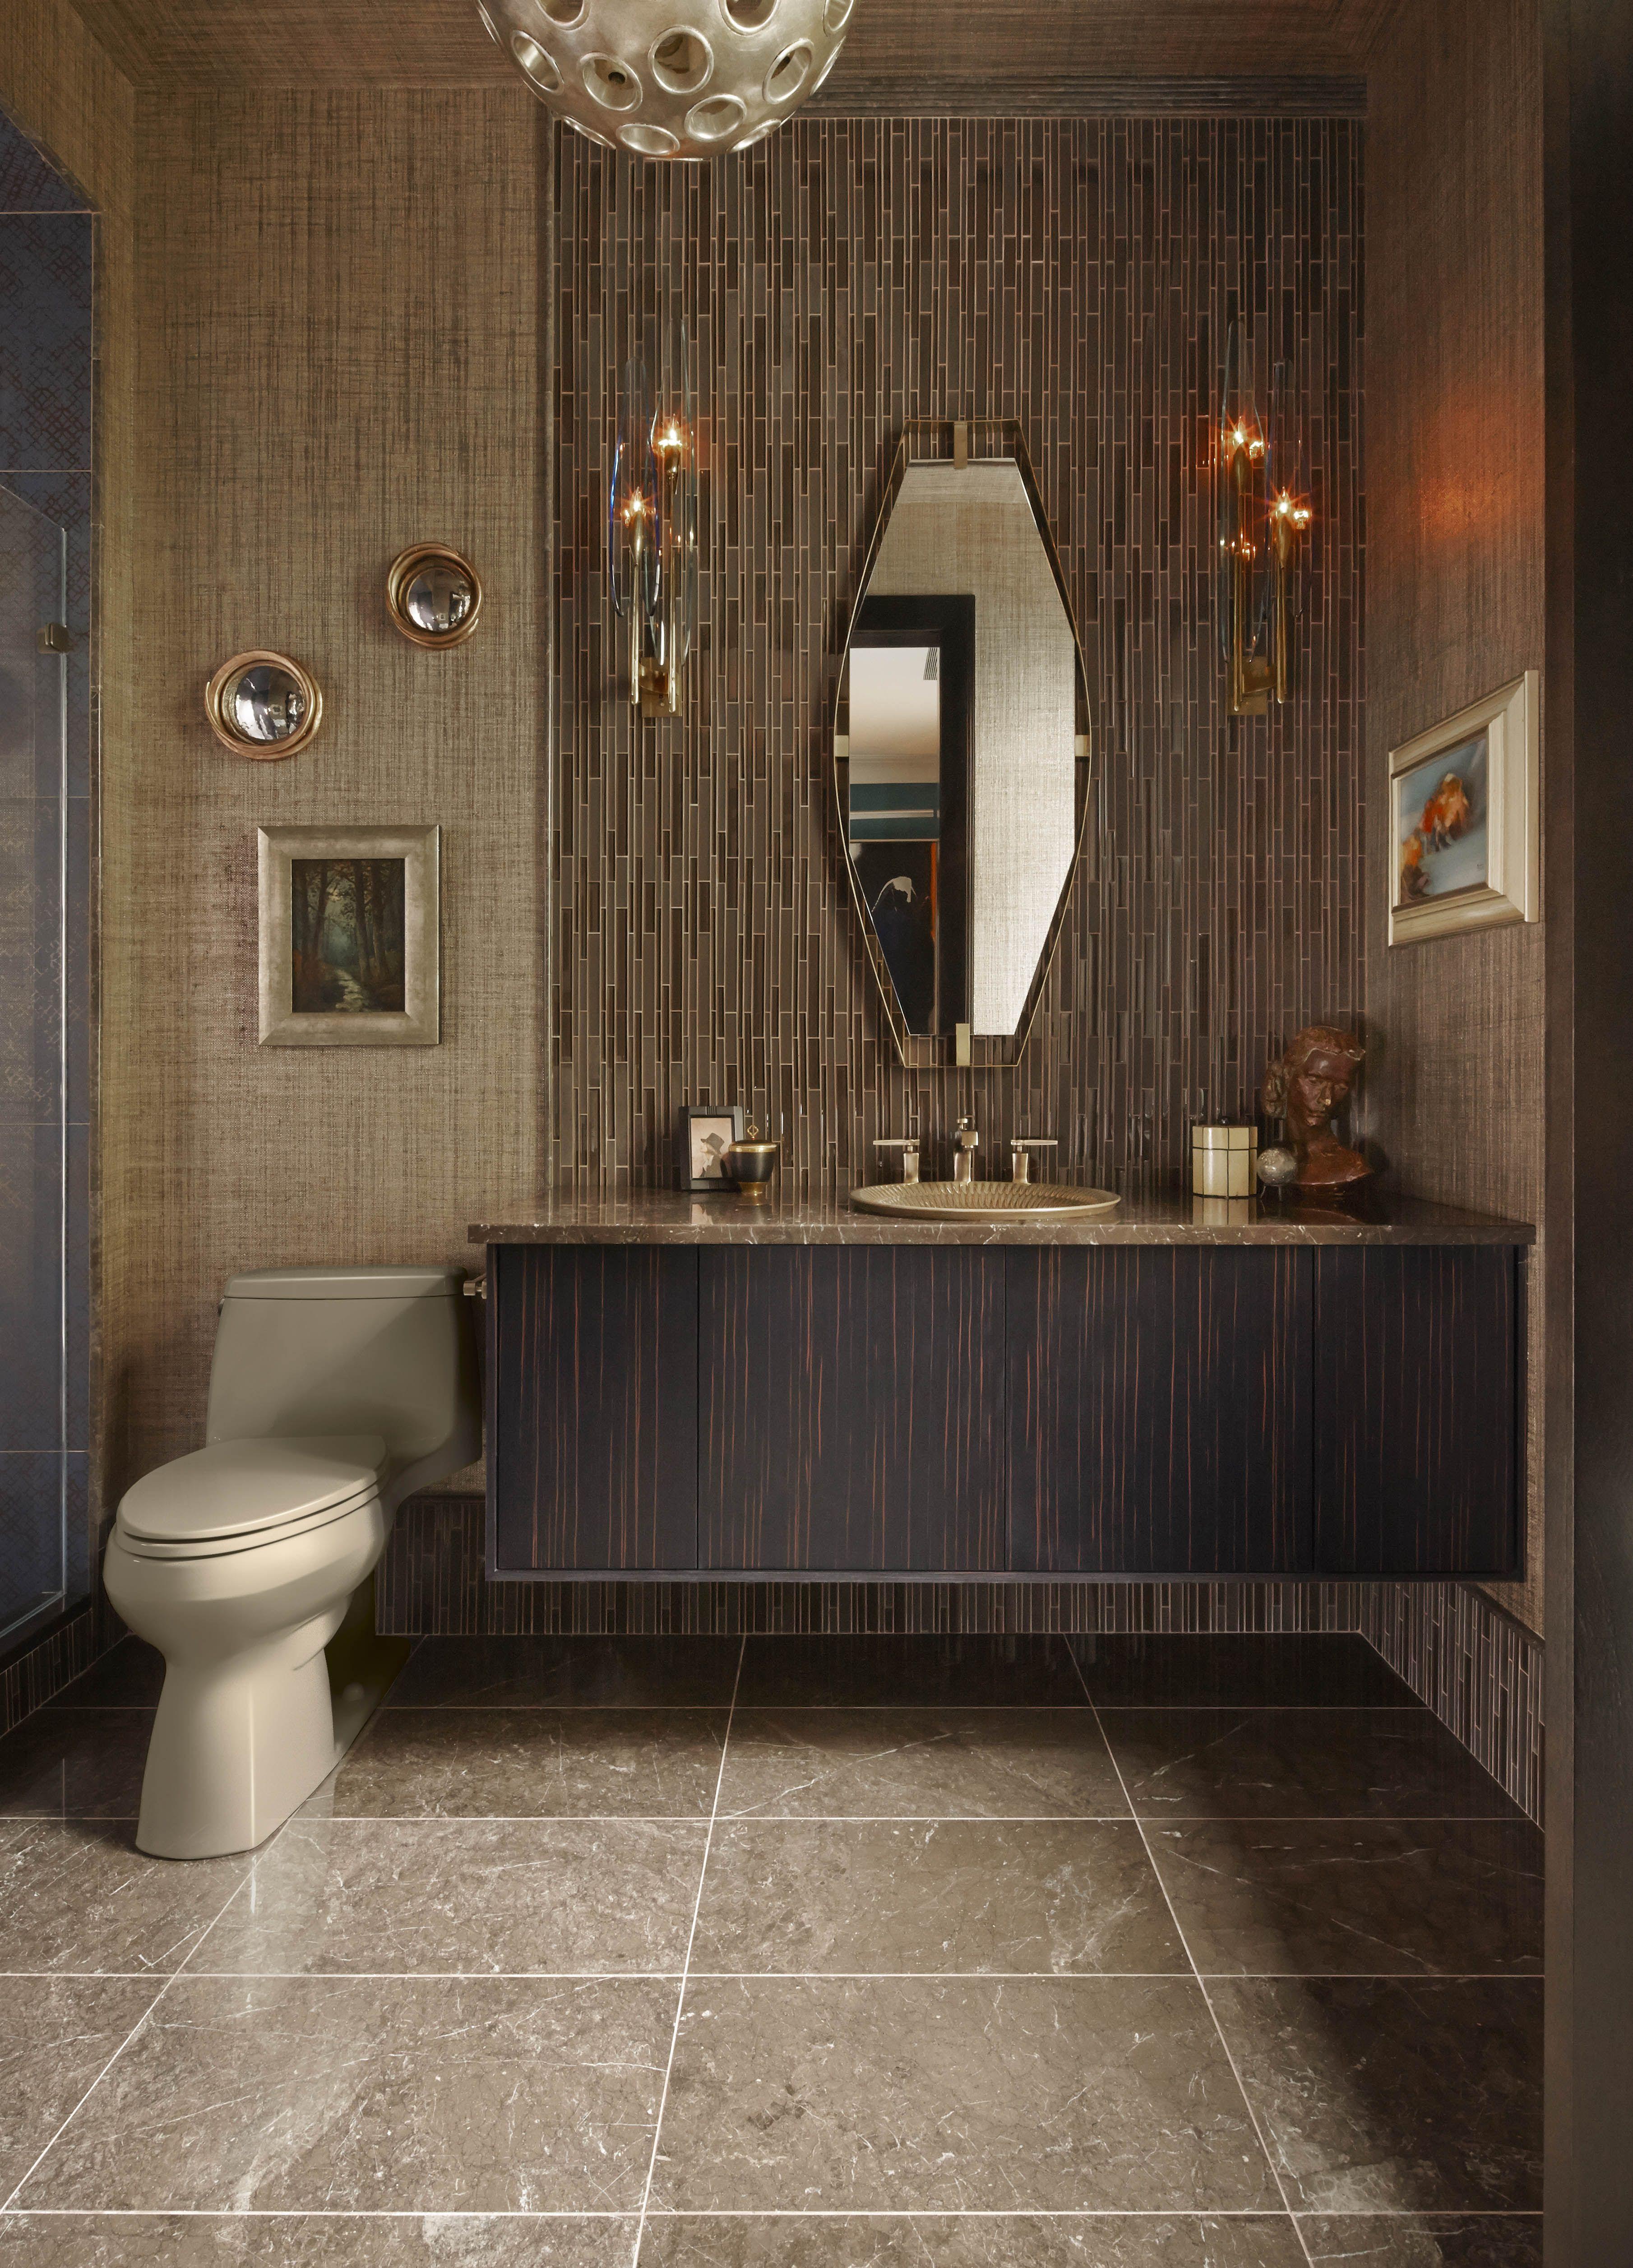 Ember Prism Bathroom Kohler Ideas Small Bathroom Decor Bathroom Colors Bathroom Decor Kohler bathroom design ideas